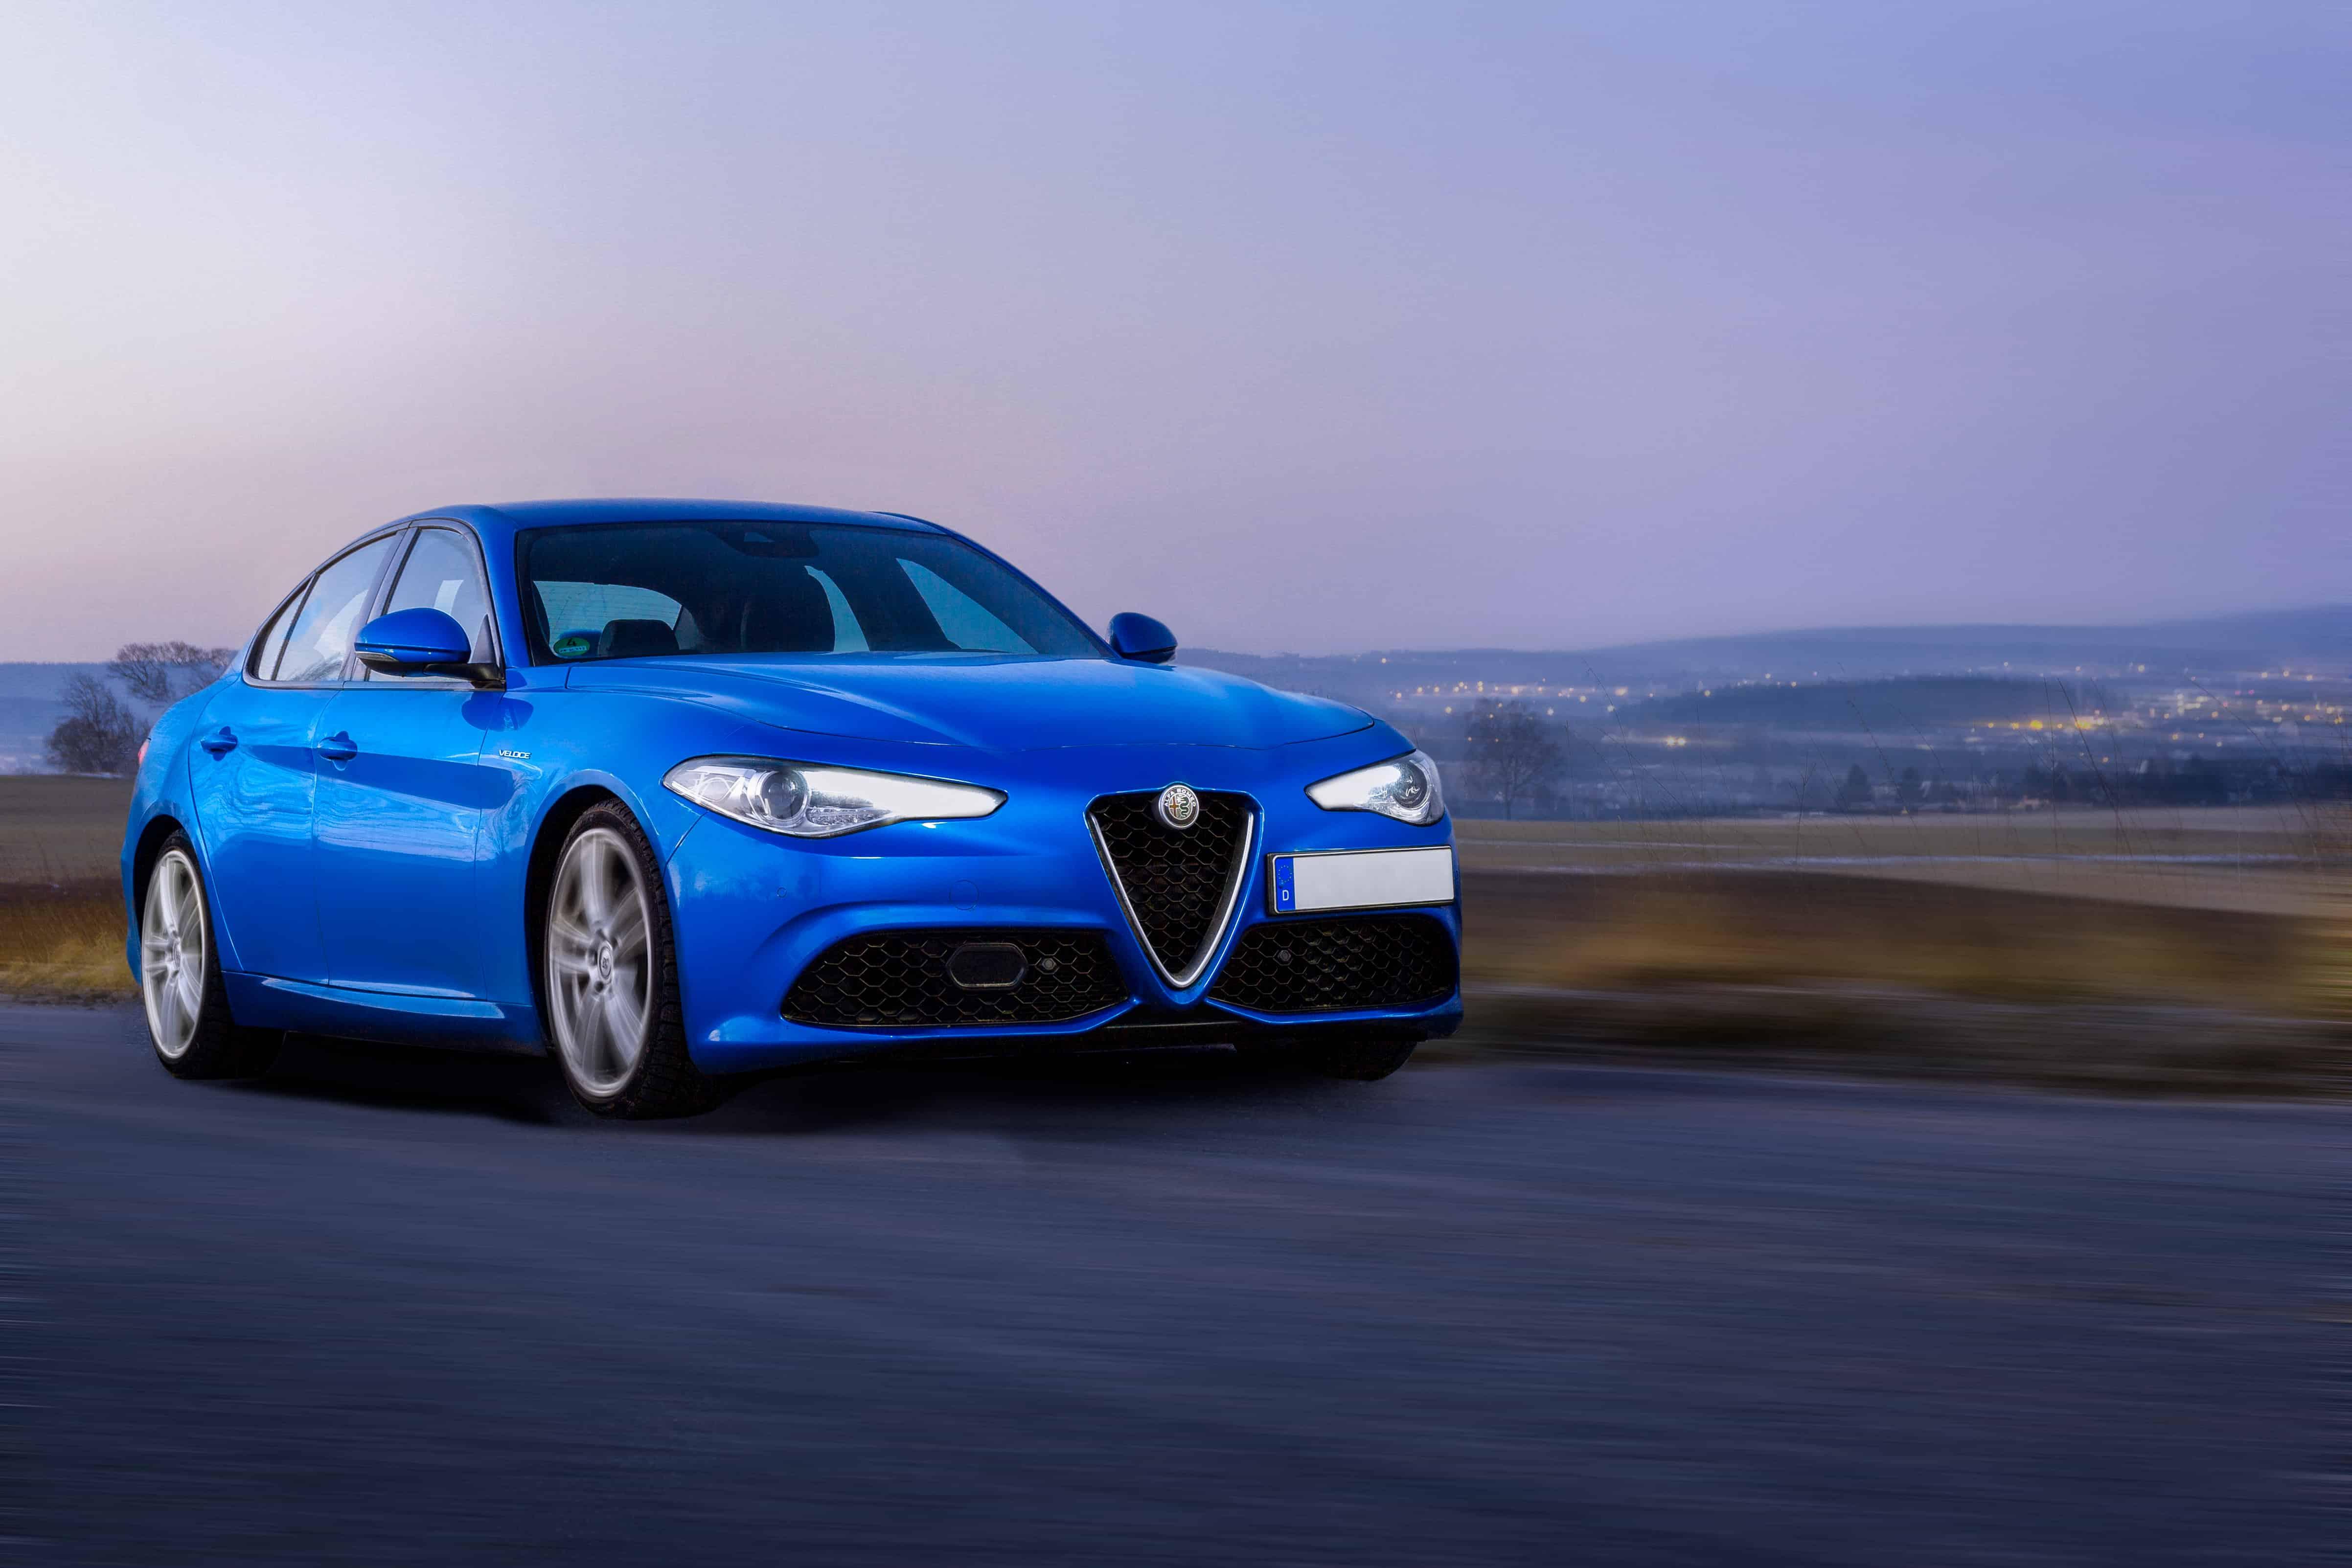 Chrysler Recalls More Than 6,000 Alfa Romero Giulia Vehicles for Brake Line Defect